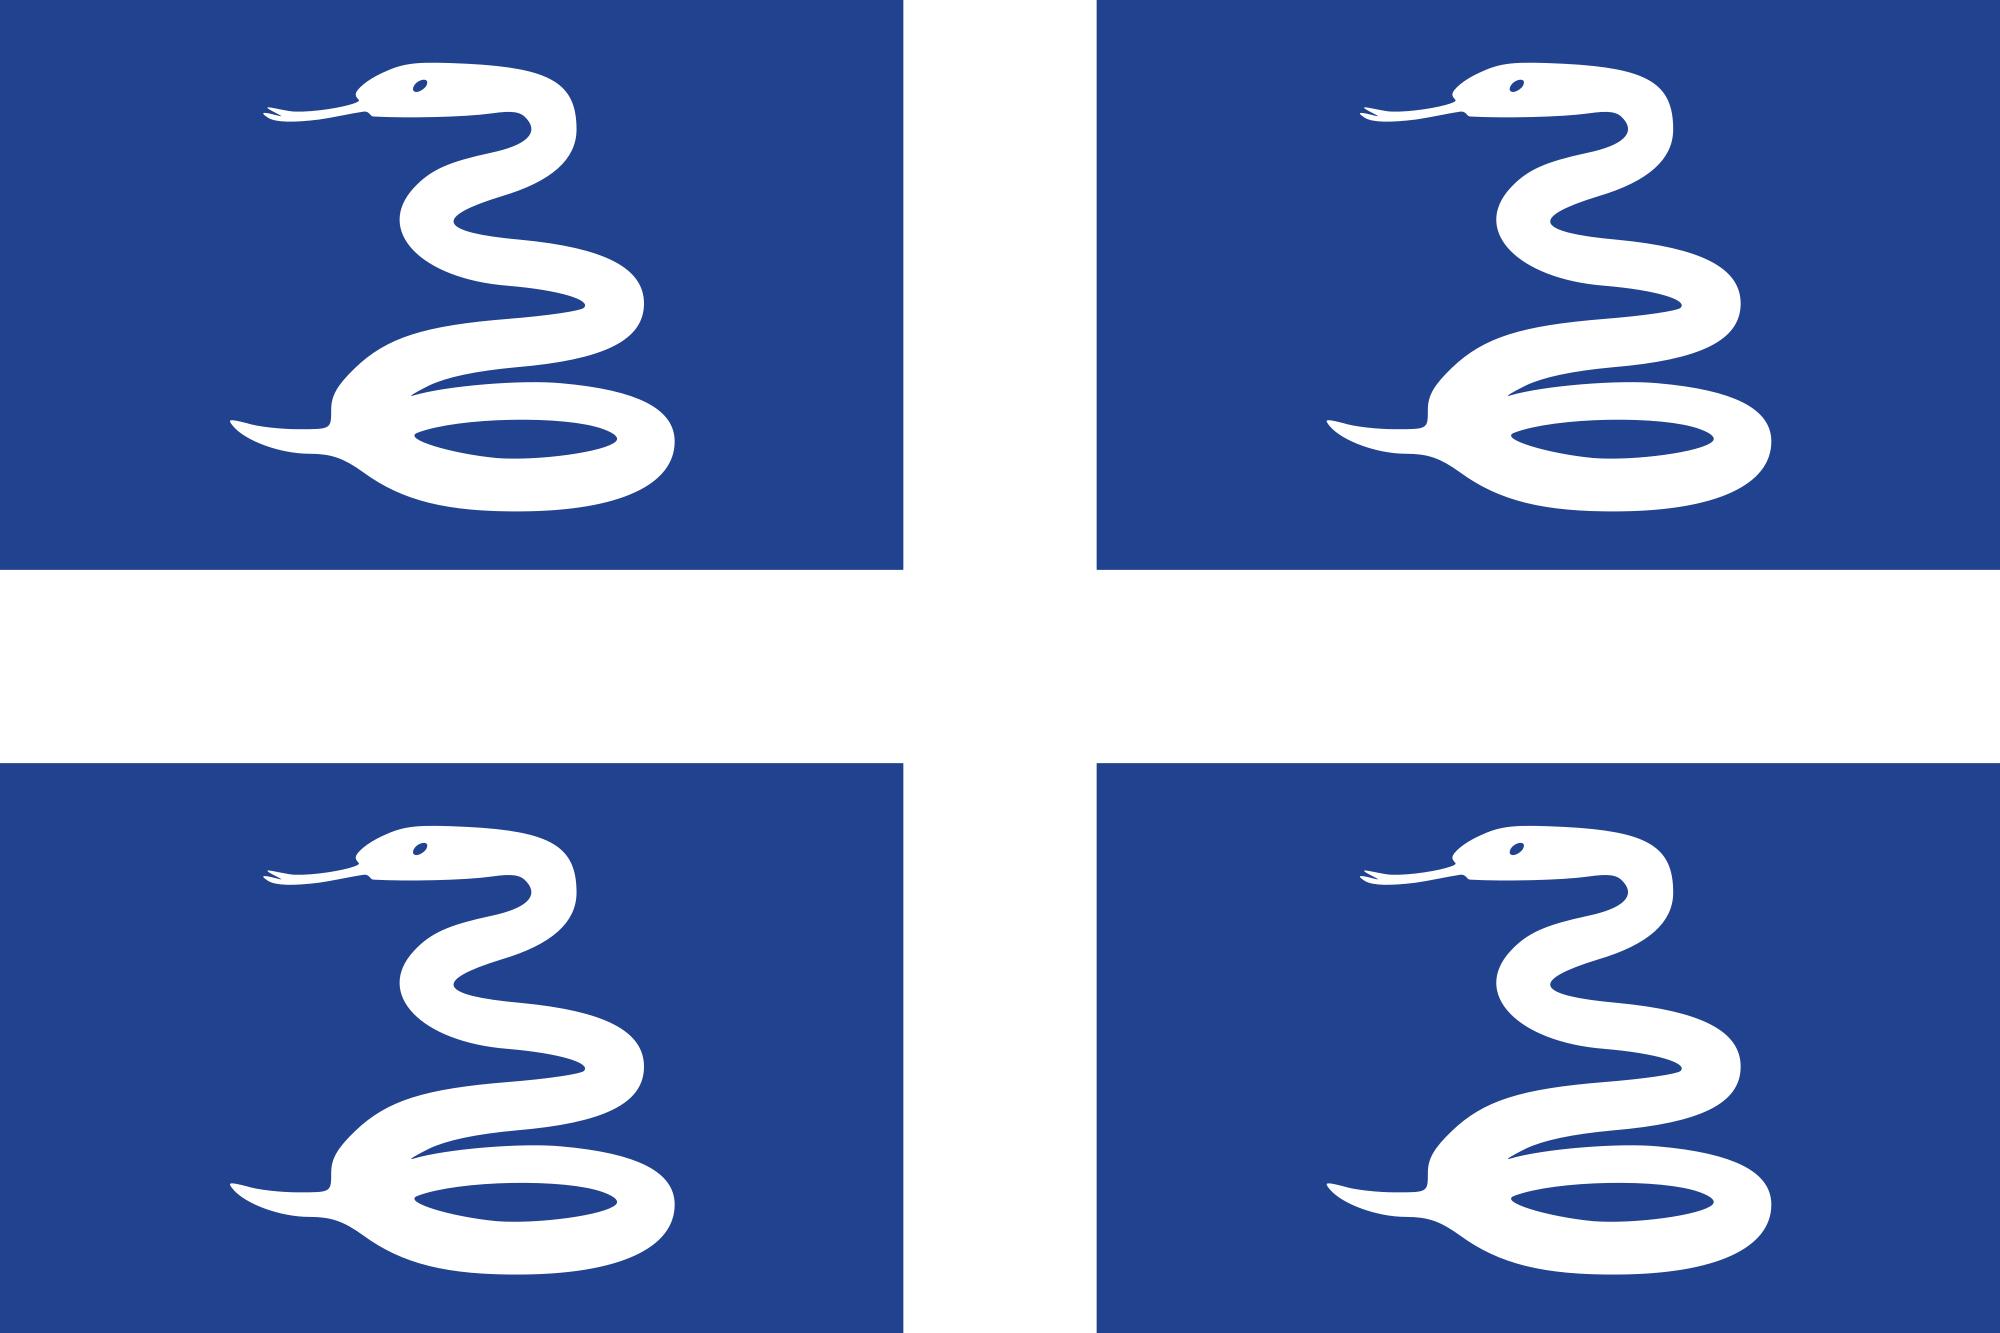 martinica, país, emblema, insignia, प्रतीक - HD वॉलपेपर - प्रोफेसर-falken.com